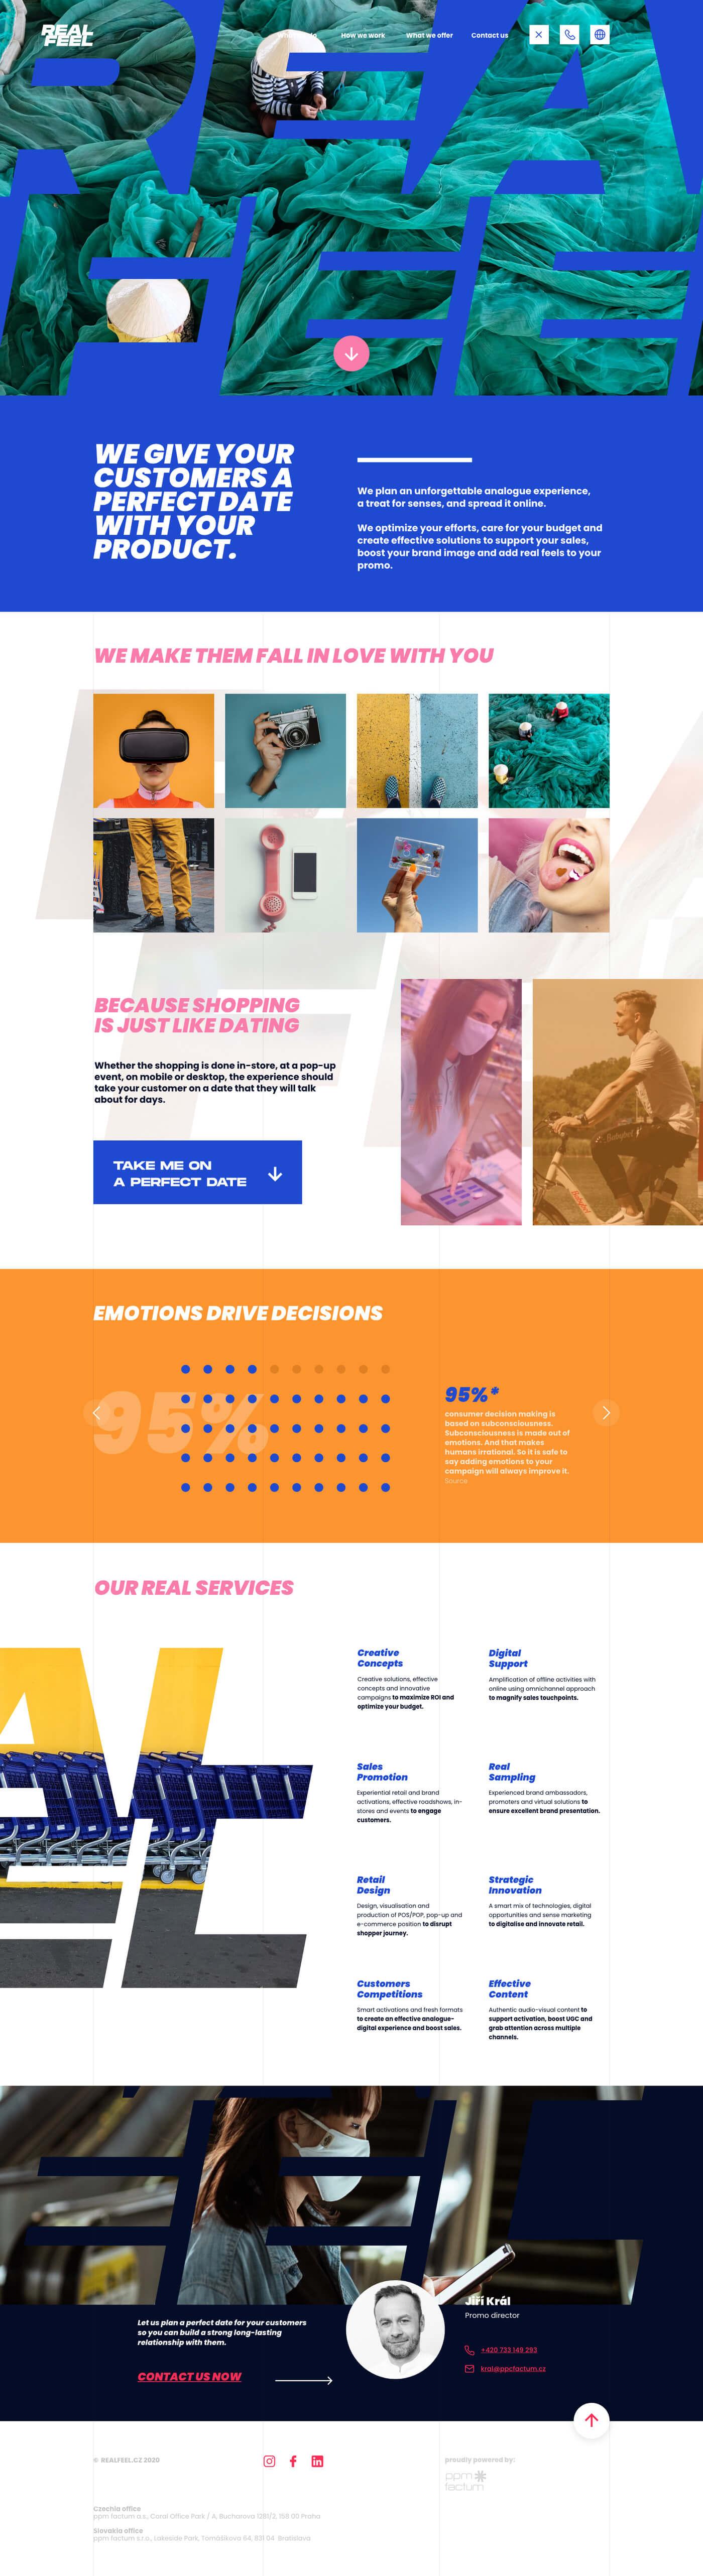 realfeel webdesign